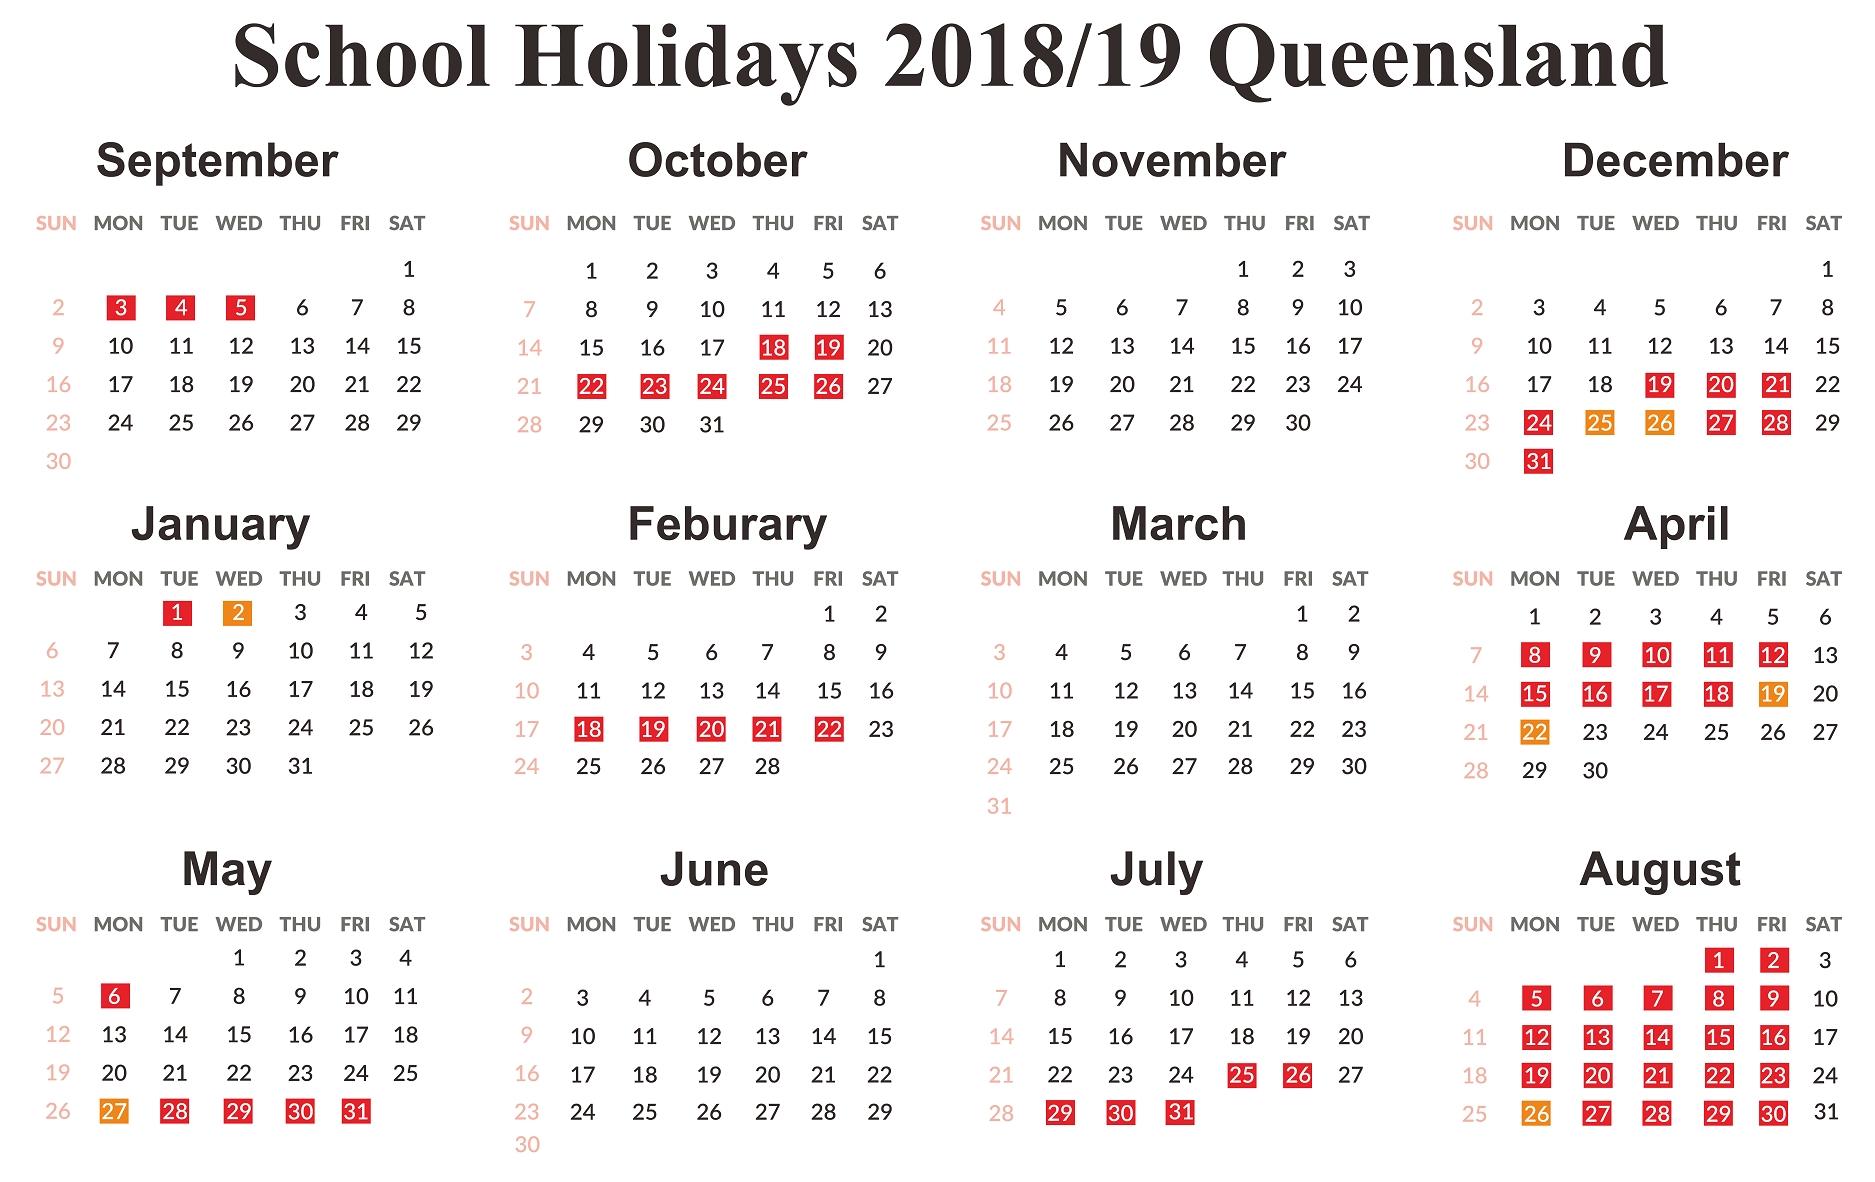 Incredible Calendar 2019 Qld School • Printable Blank Calendar Template Calendar 2019 Qld School Holidays